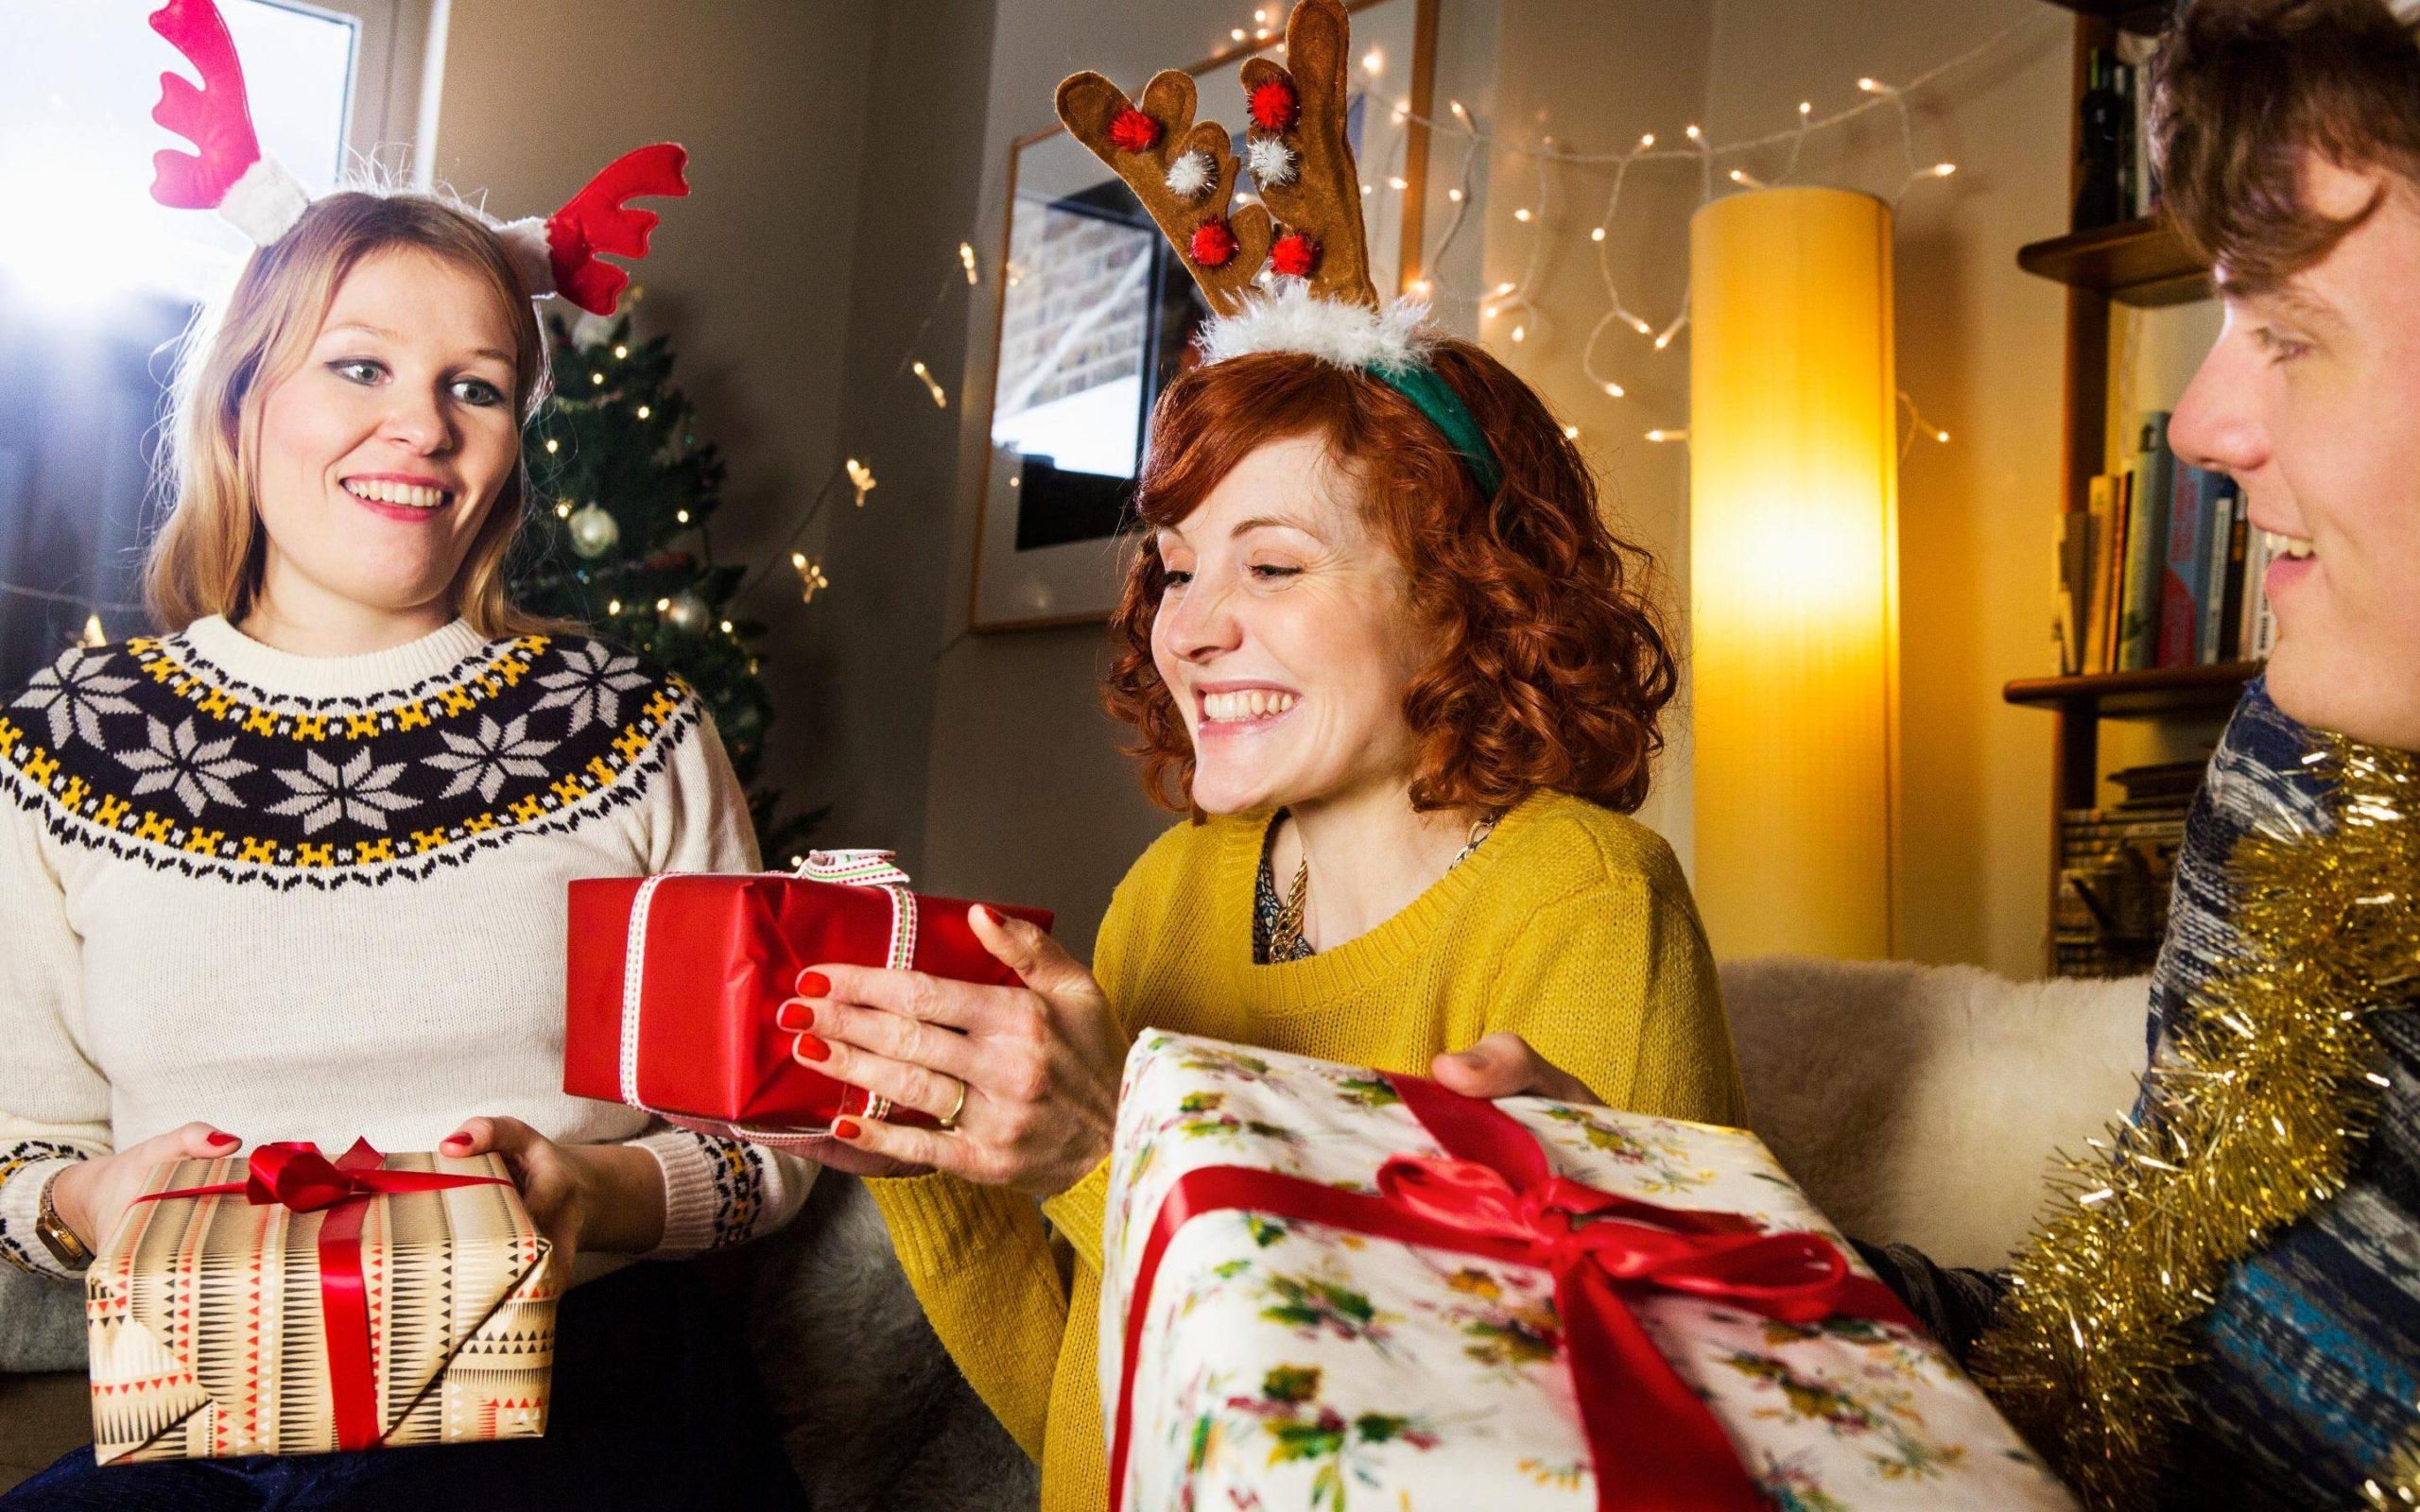 Cadeaux joliment emballés.